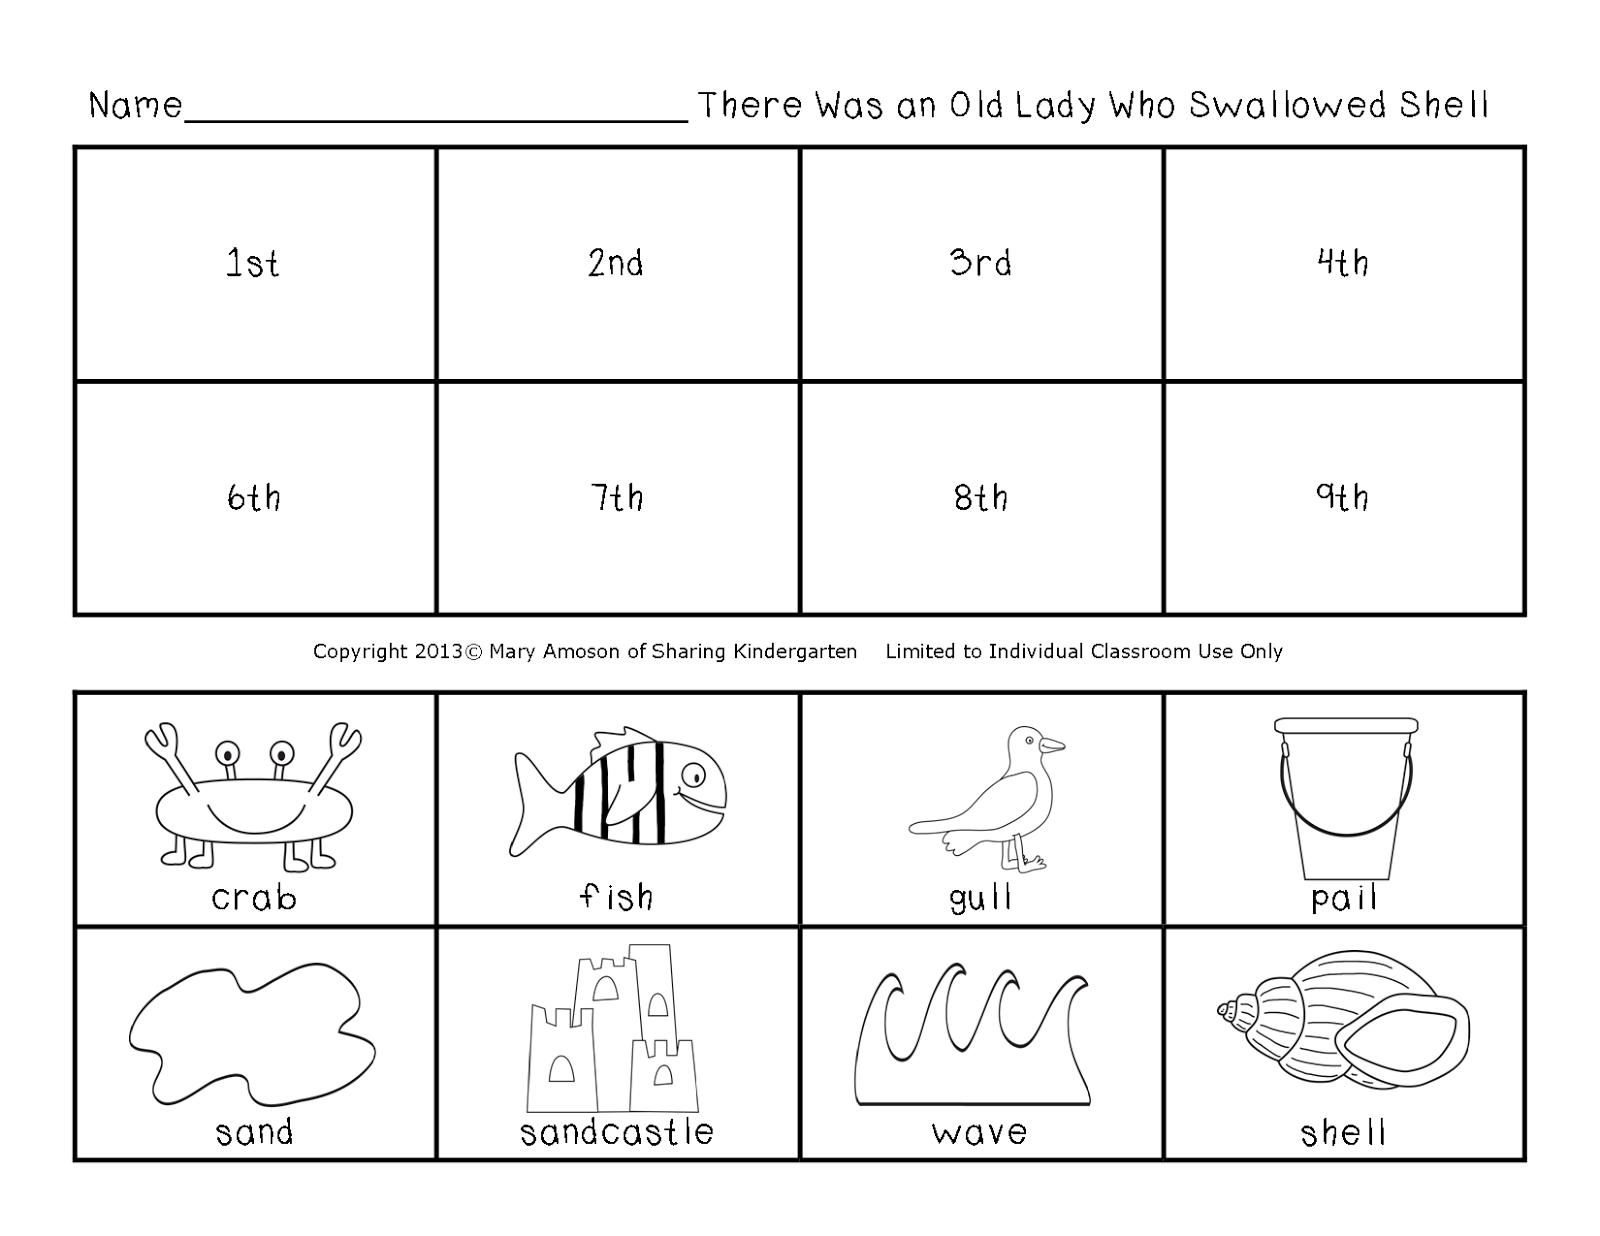 http://www.sharingkindergarten.com/2013/05/bigger-and-badder.html